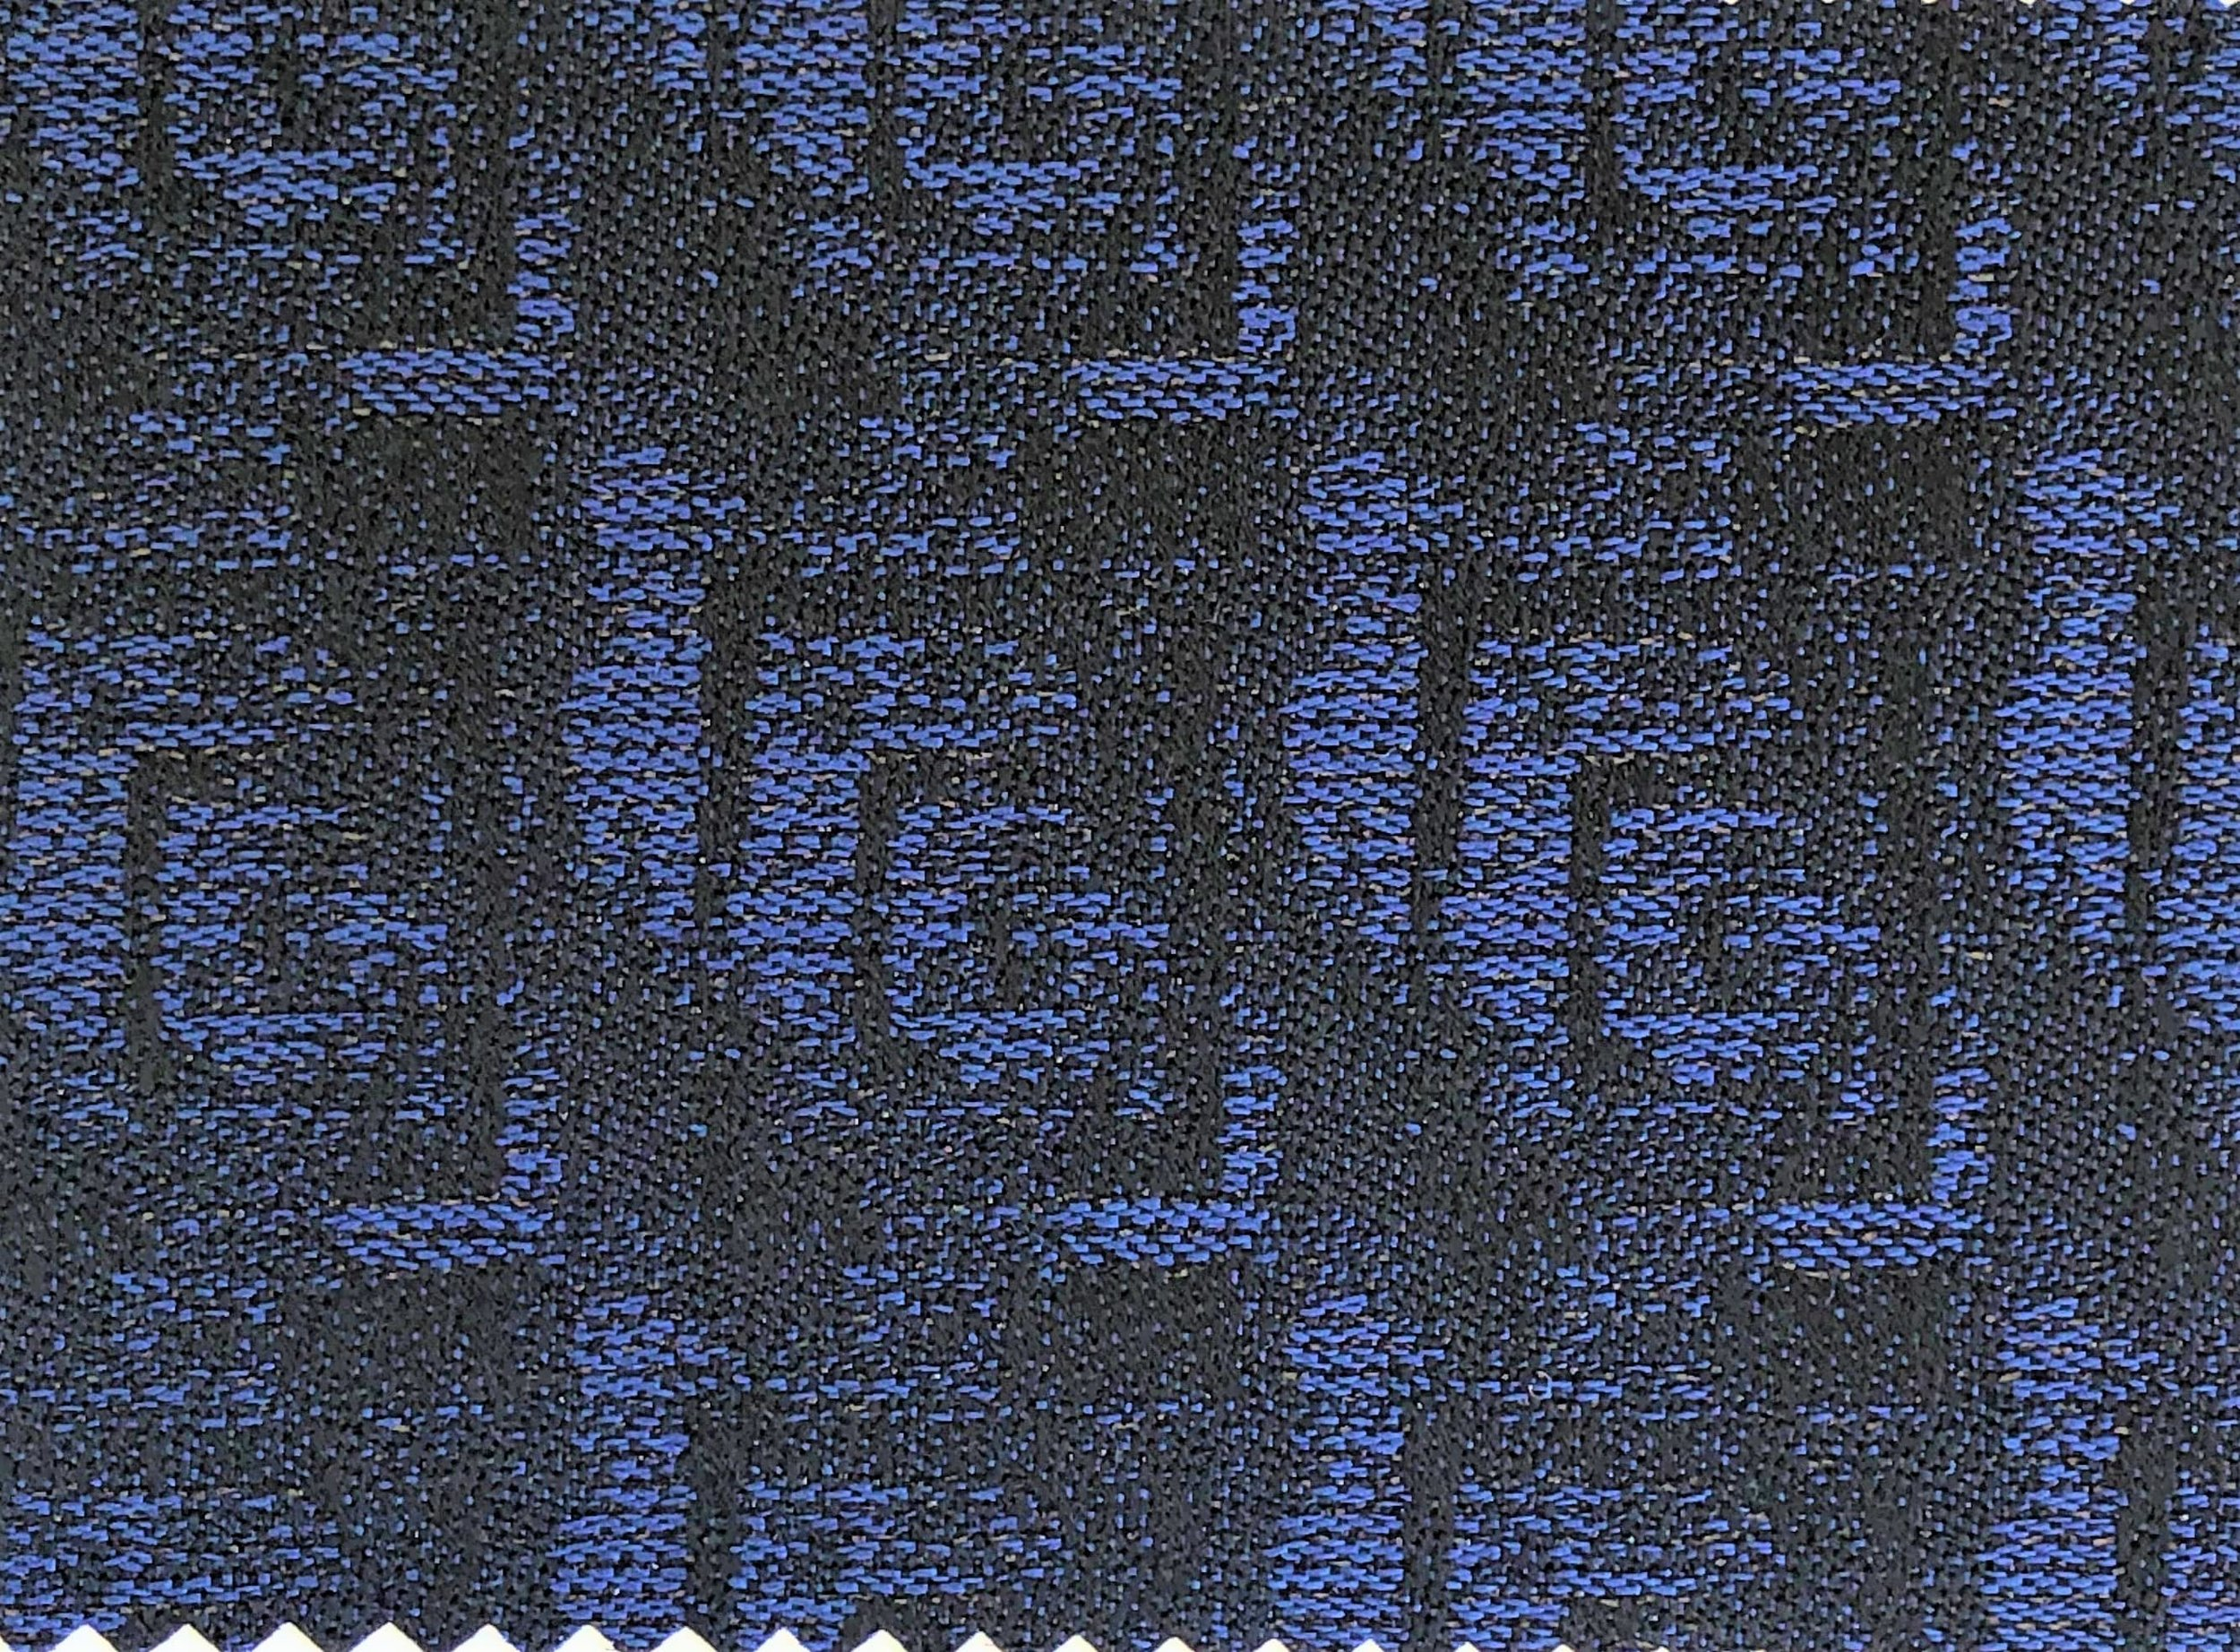 IMG_2896-min.JPG